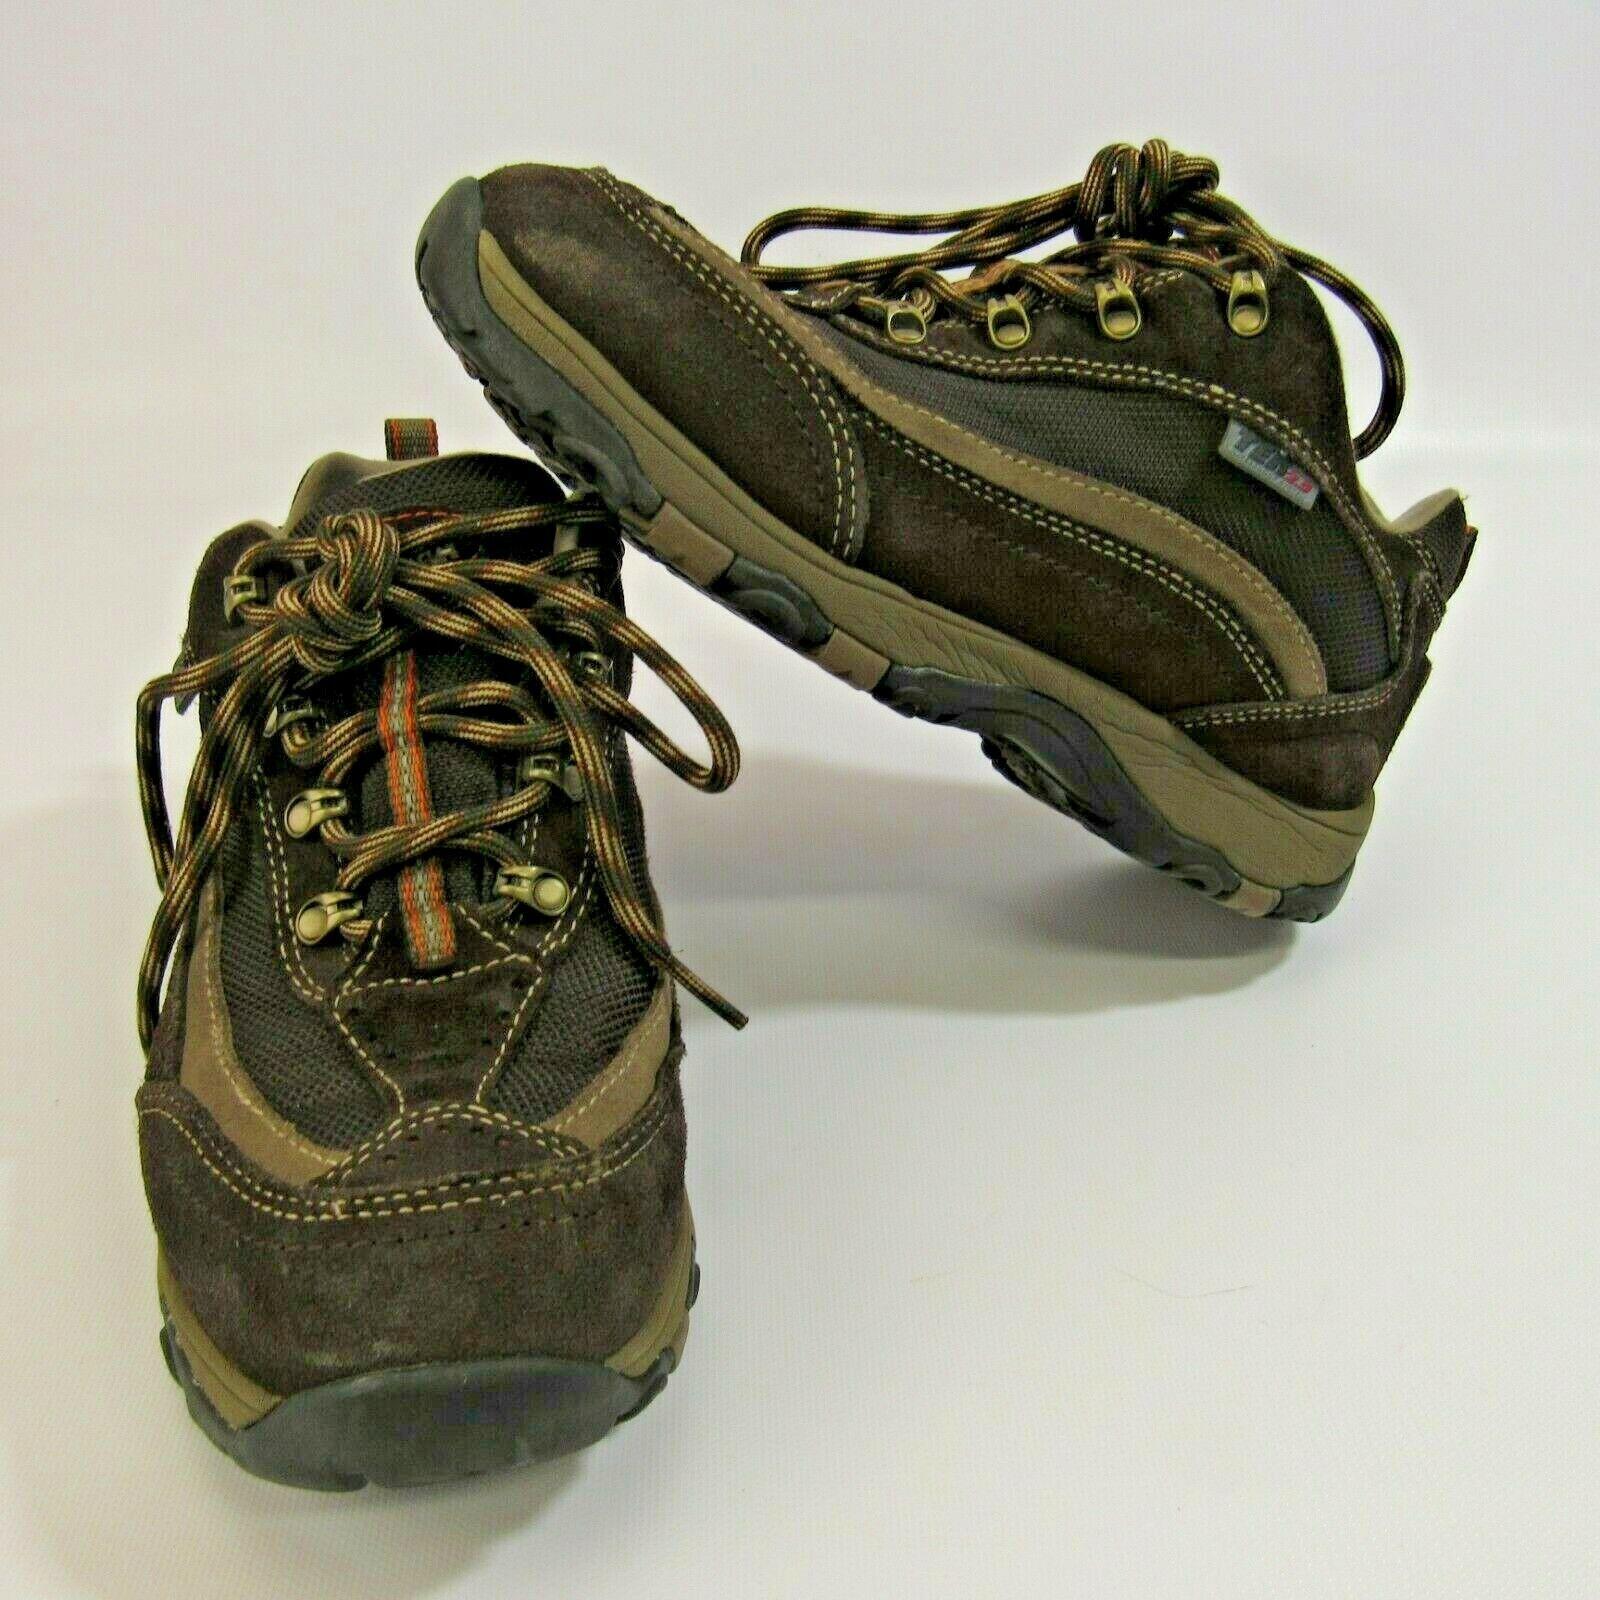 L.L. Bean Tek 2.5 Hiking shoes  Women's Size 8 Weatherproof 8M Waterproof  up to 50% off